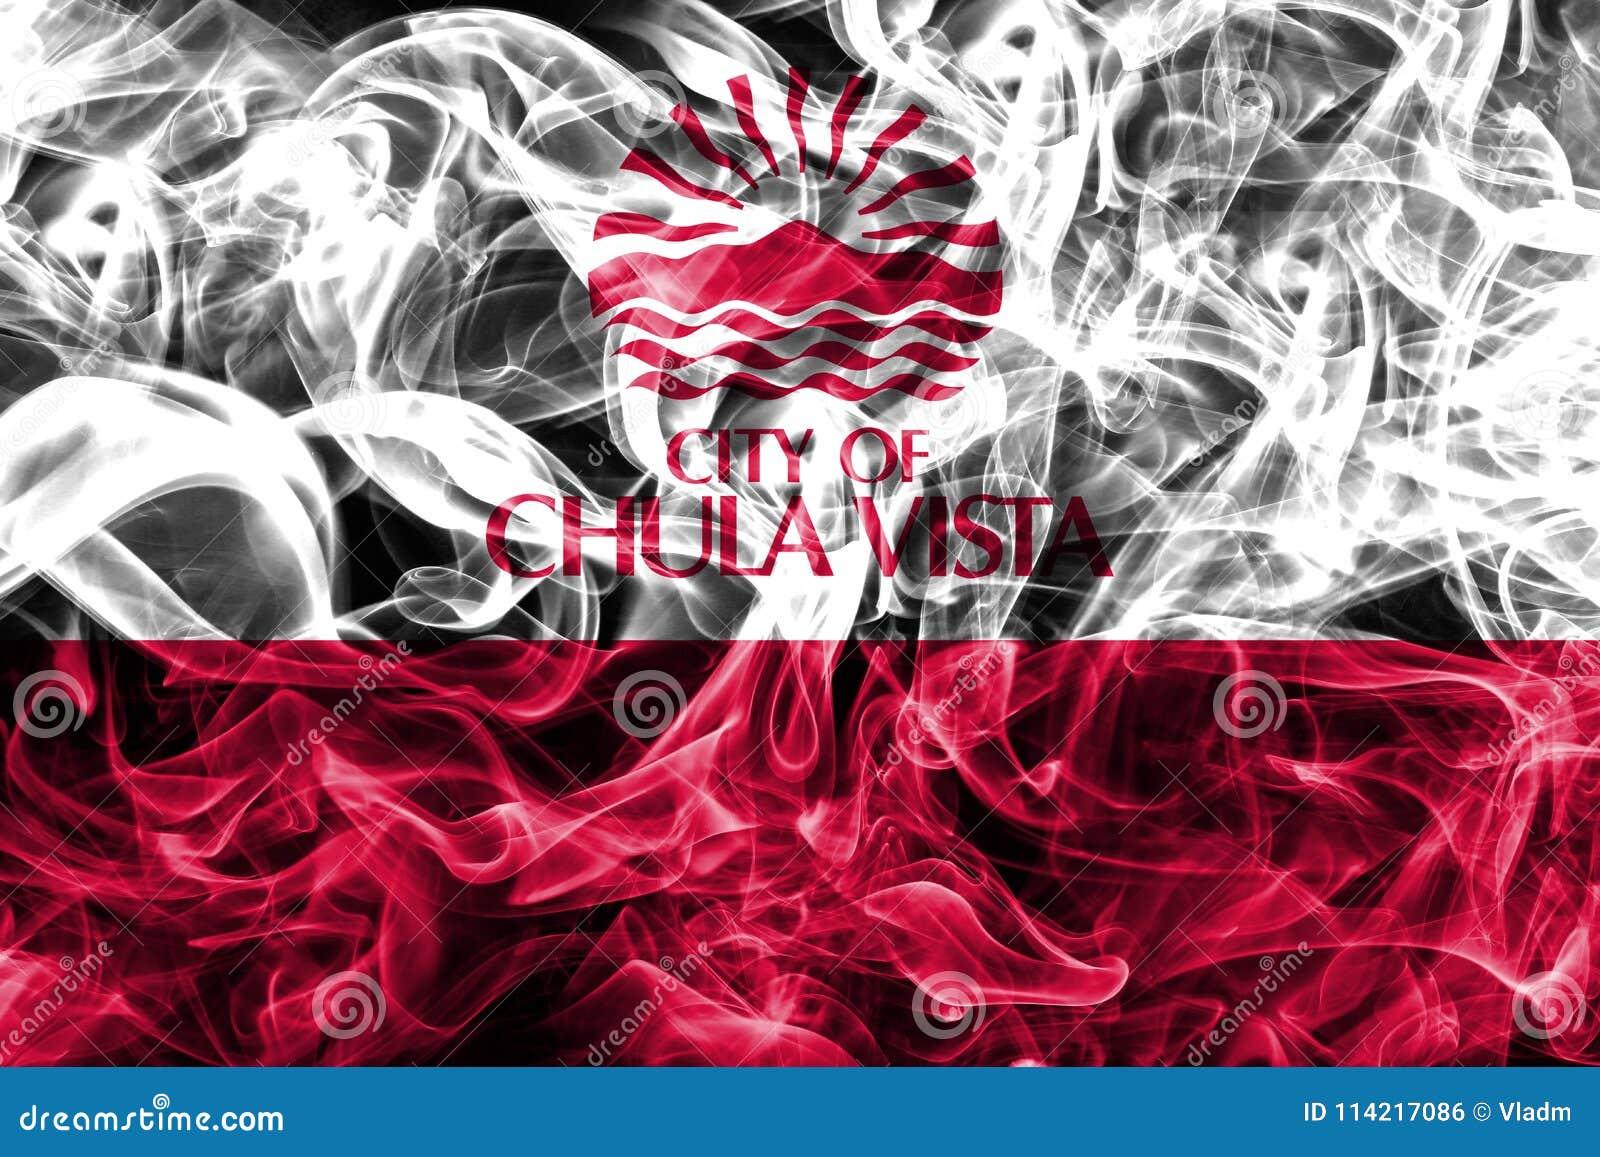 Vista Chula σημαία καπνού πόλεων, κράτος Καλιφόρνιας, Πολιτεία